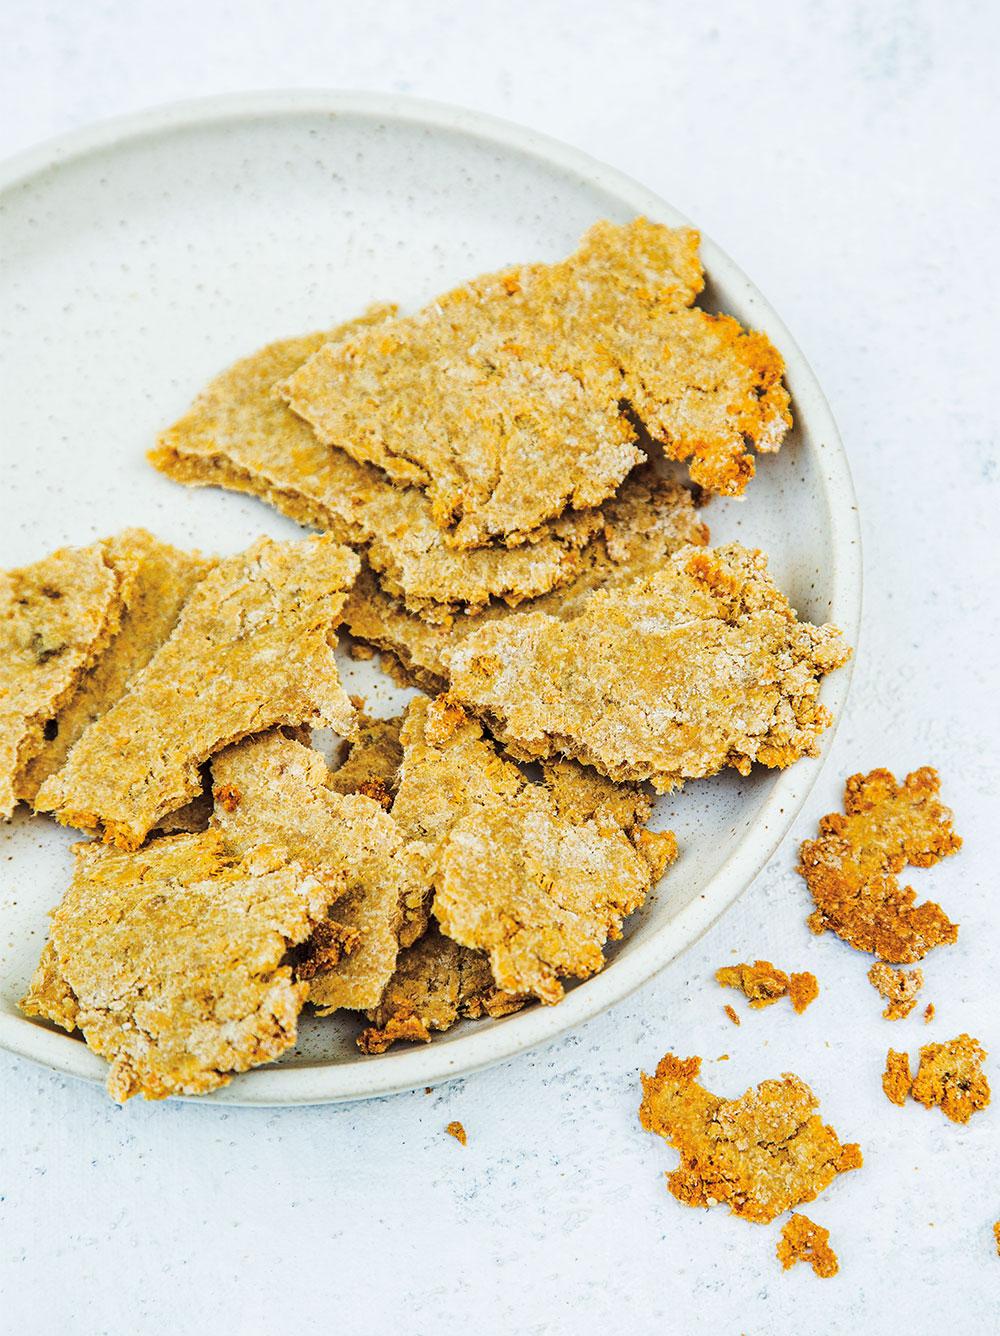 CBD infused Salmon Snacks with Catnip